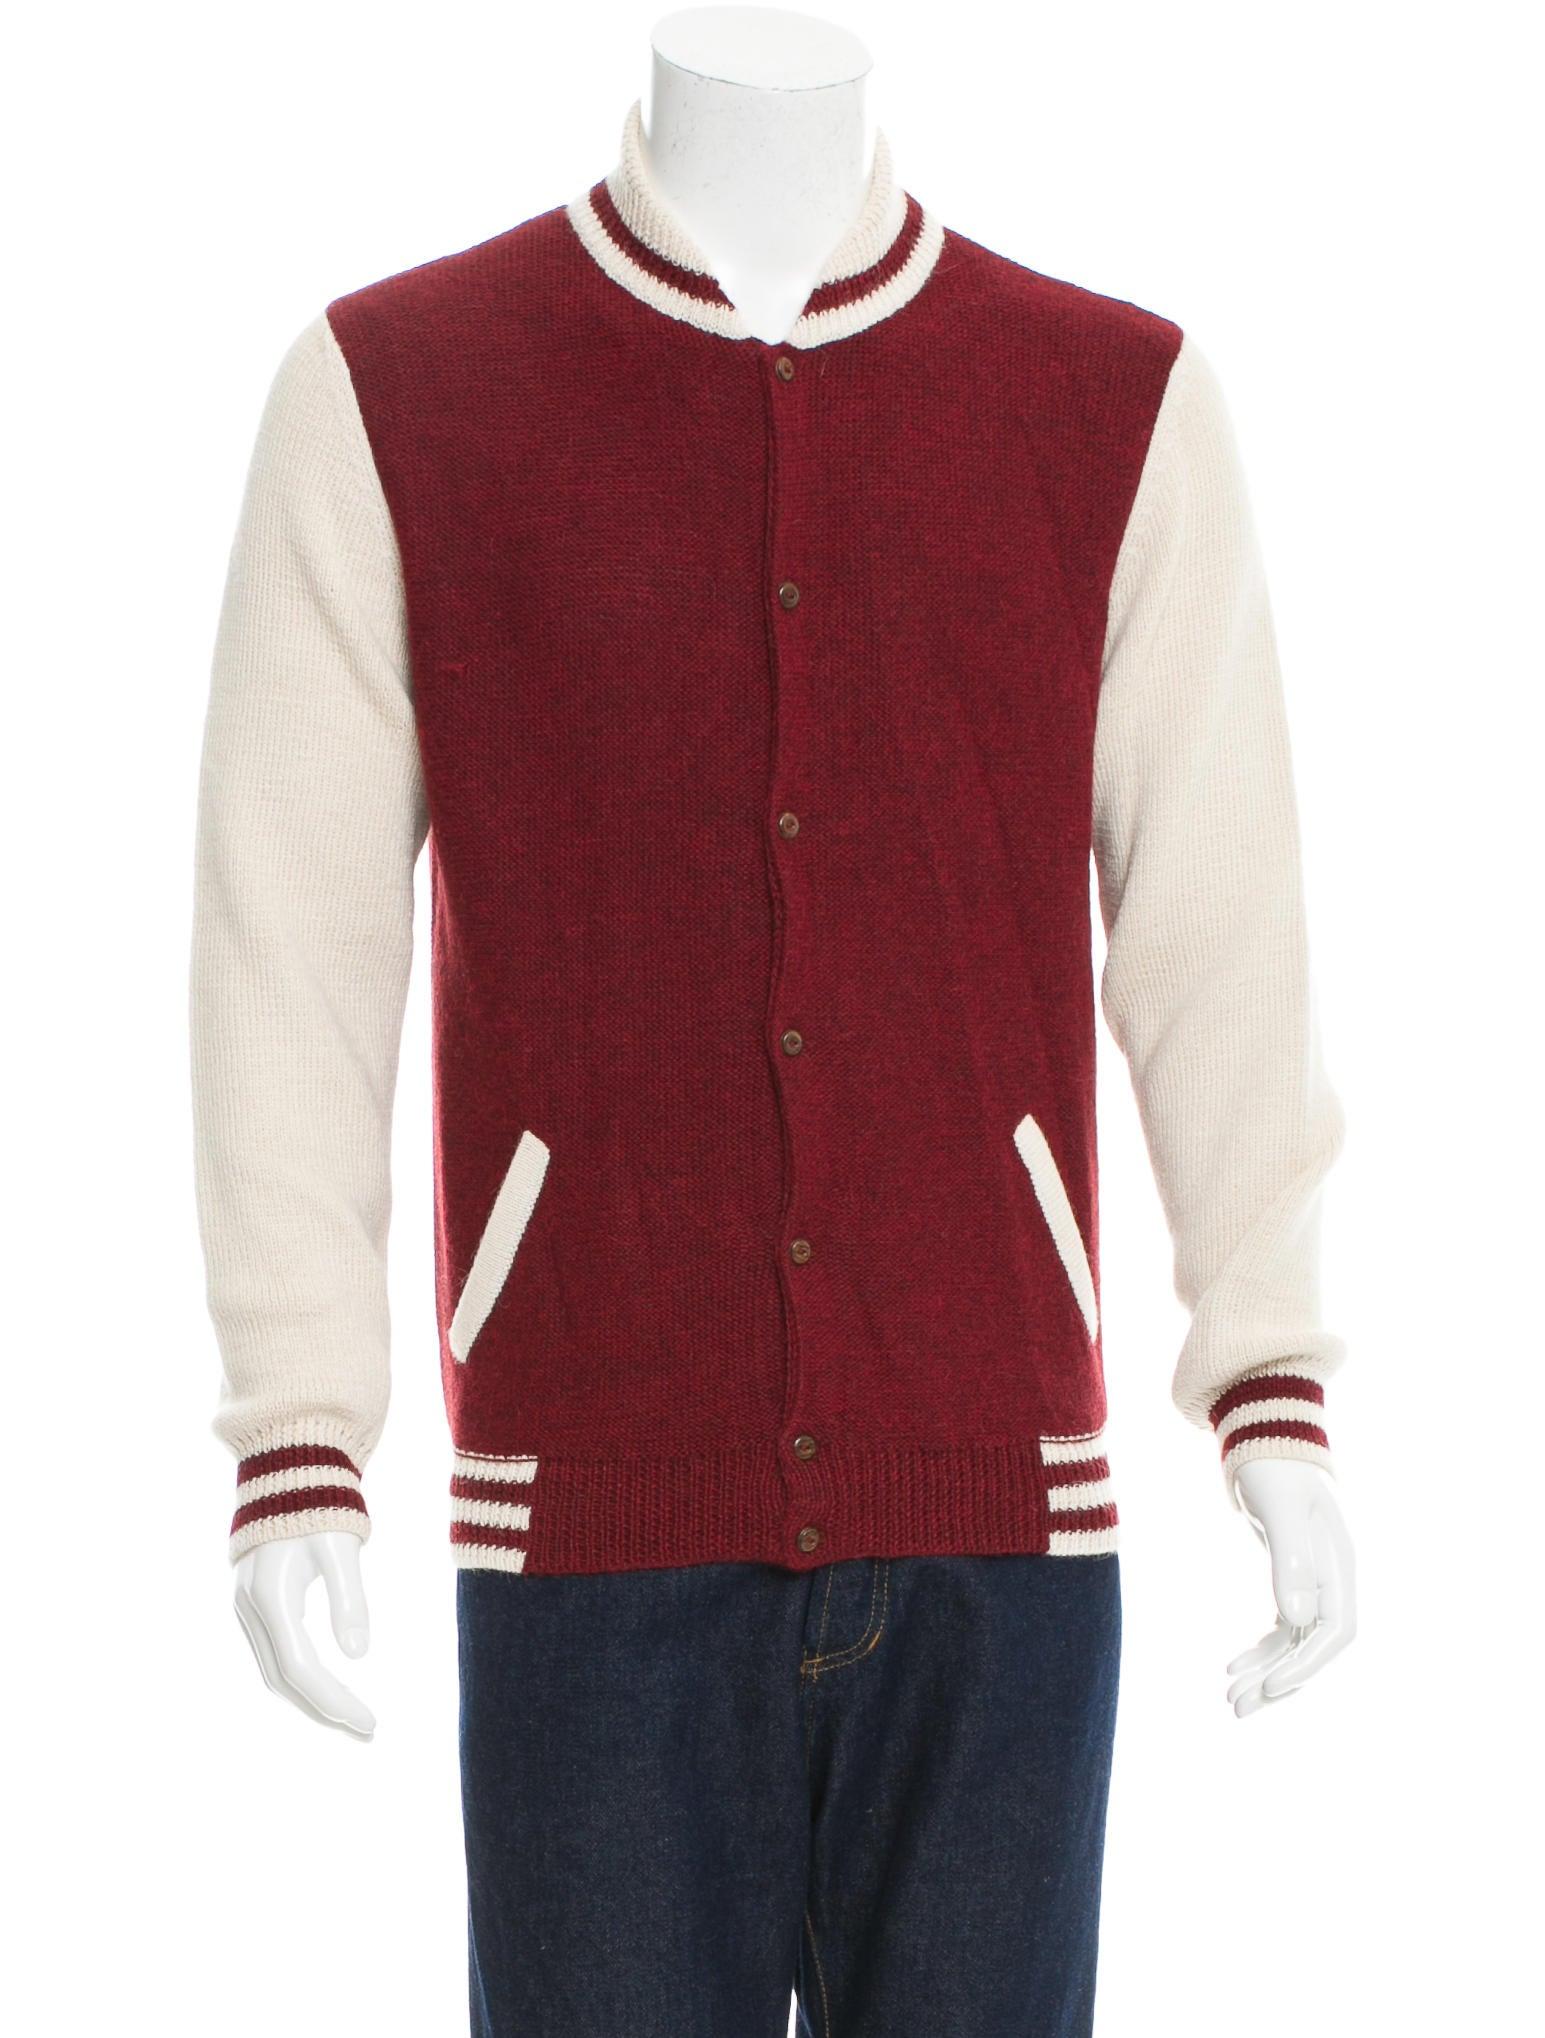 Monsieur Lacenaire Teddy Knit Varsity Jacket w/ Tags - Clothing - MLC20033 ...